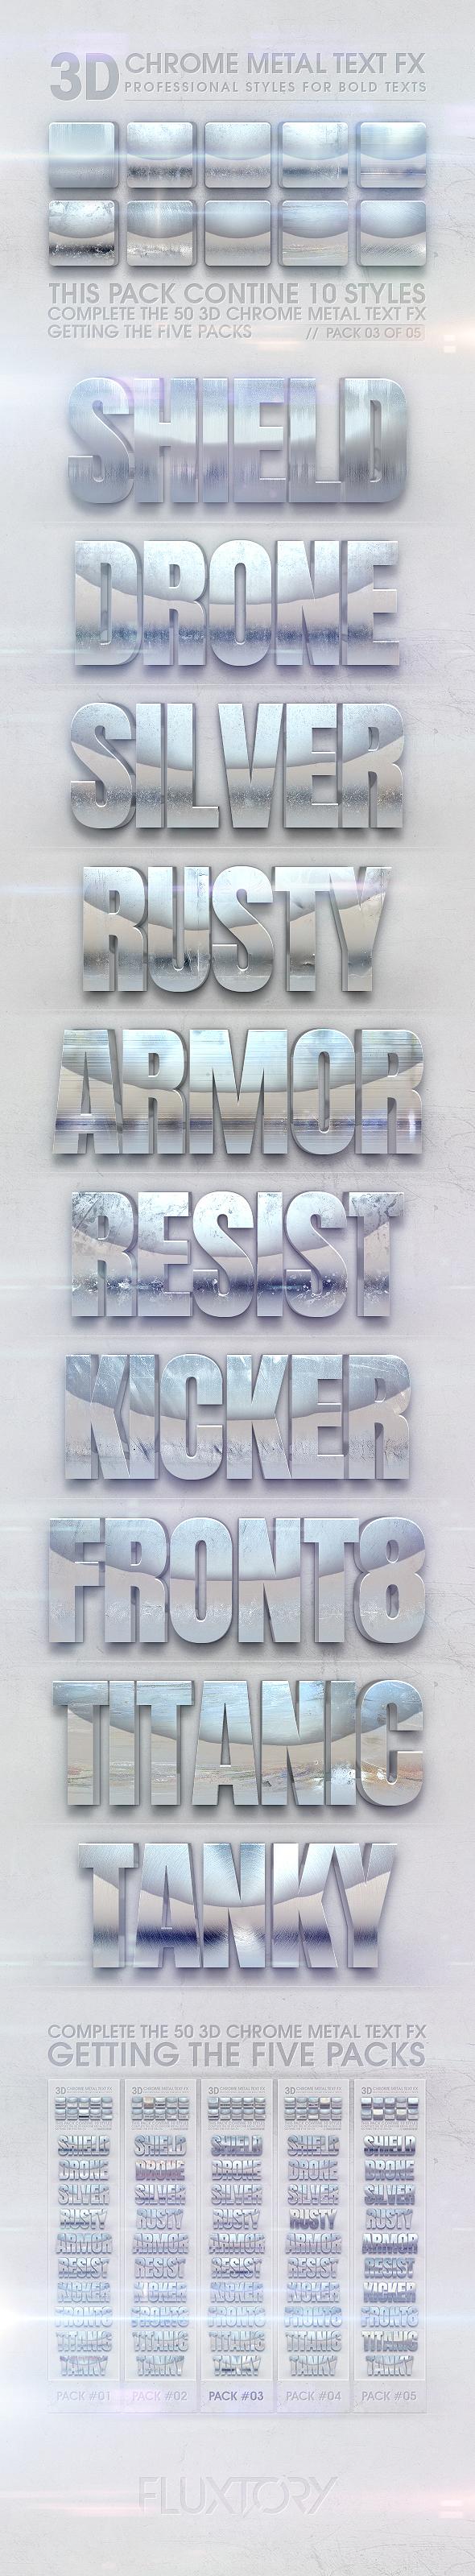 3D Chrome Metal Text FX 03 of 05